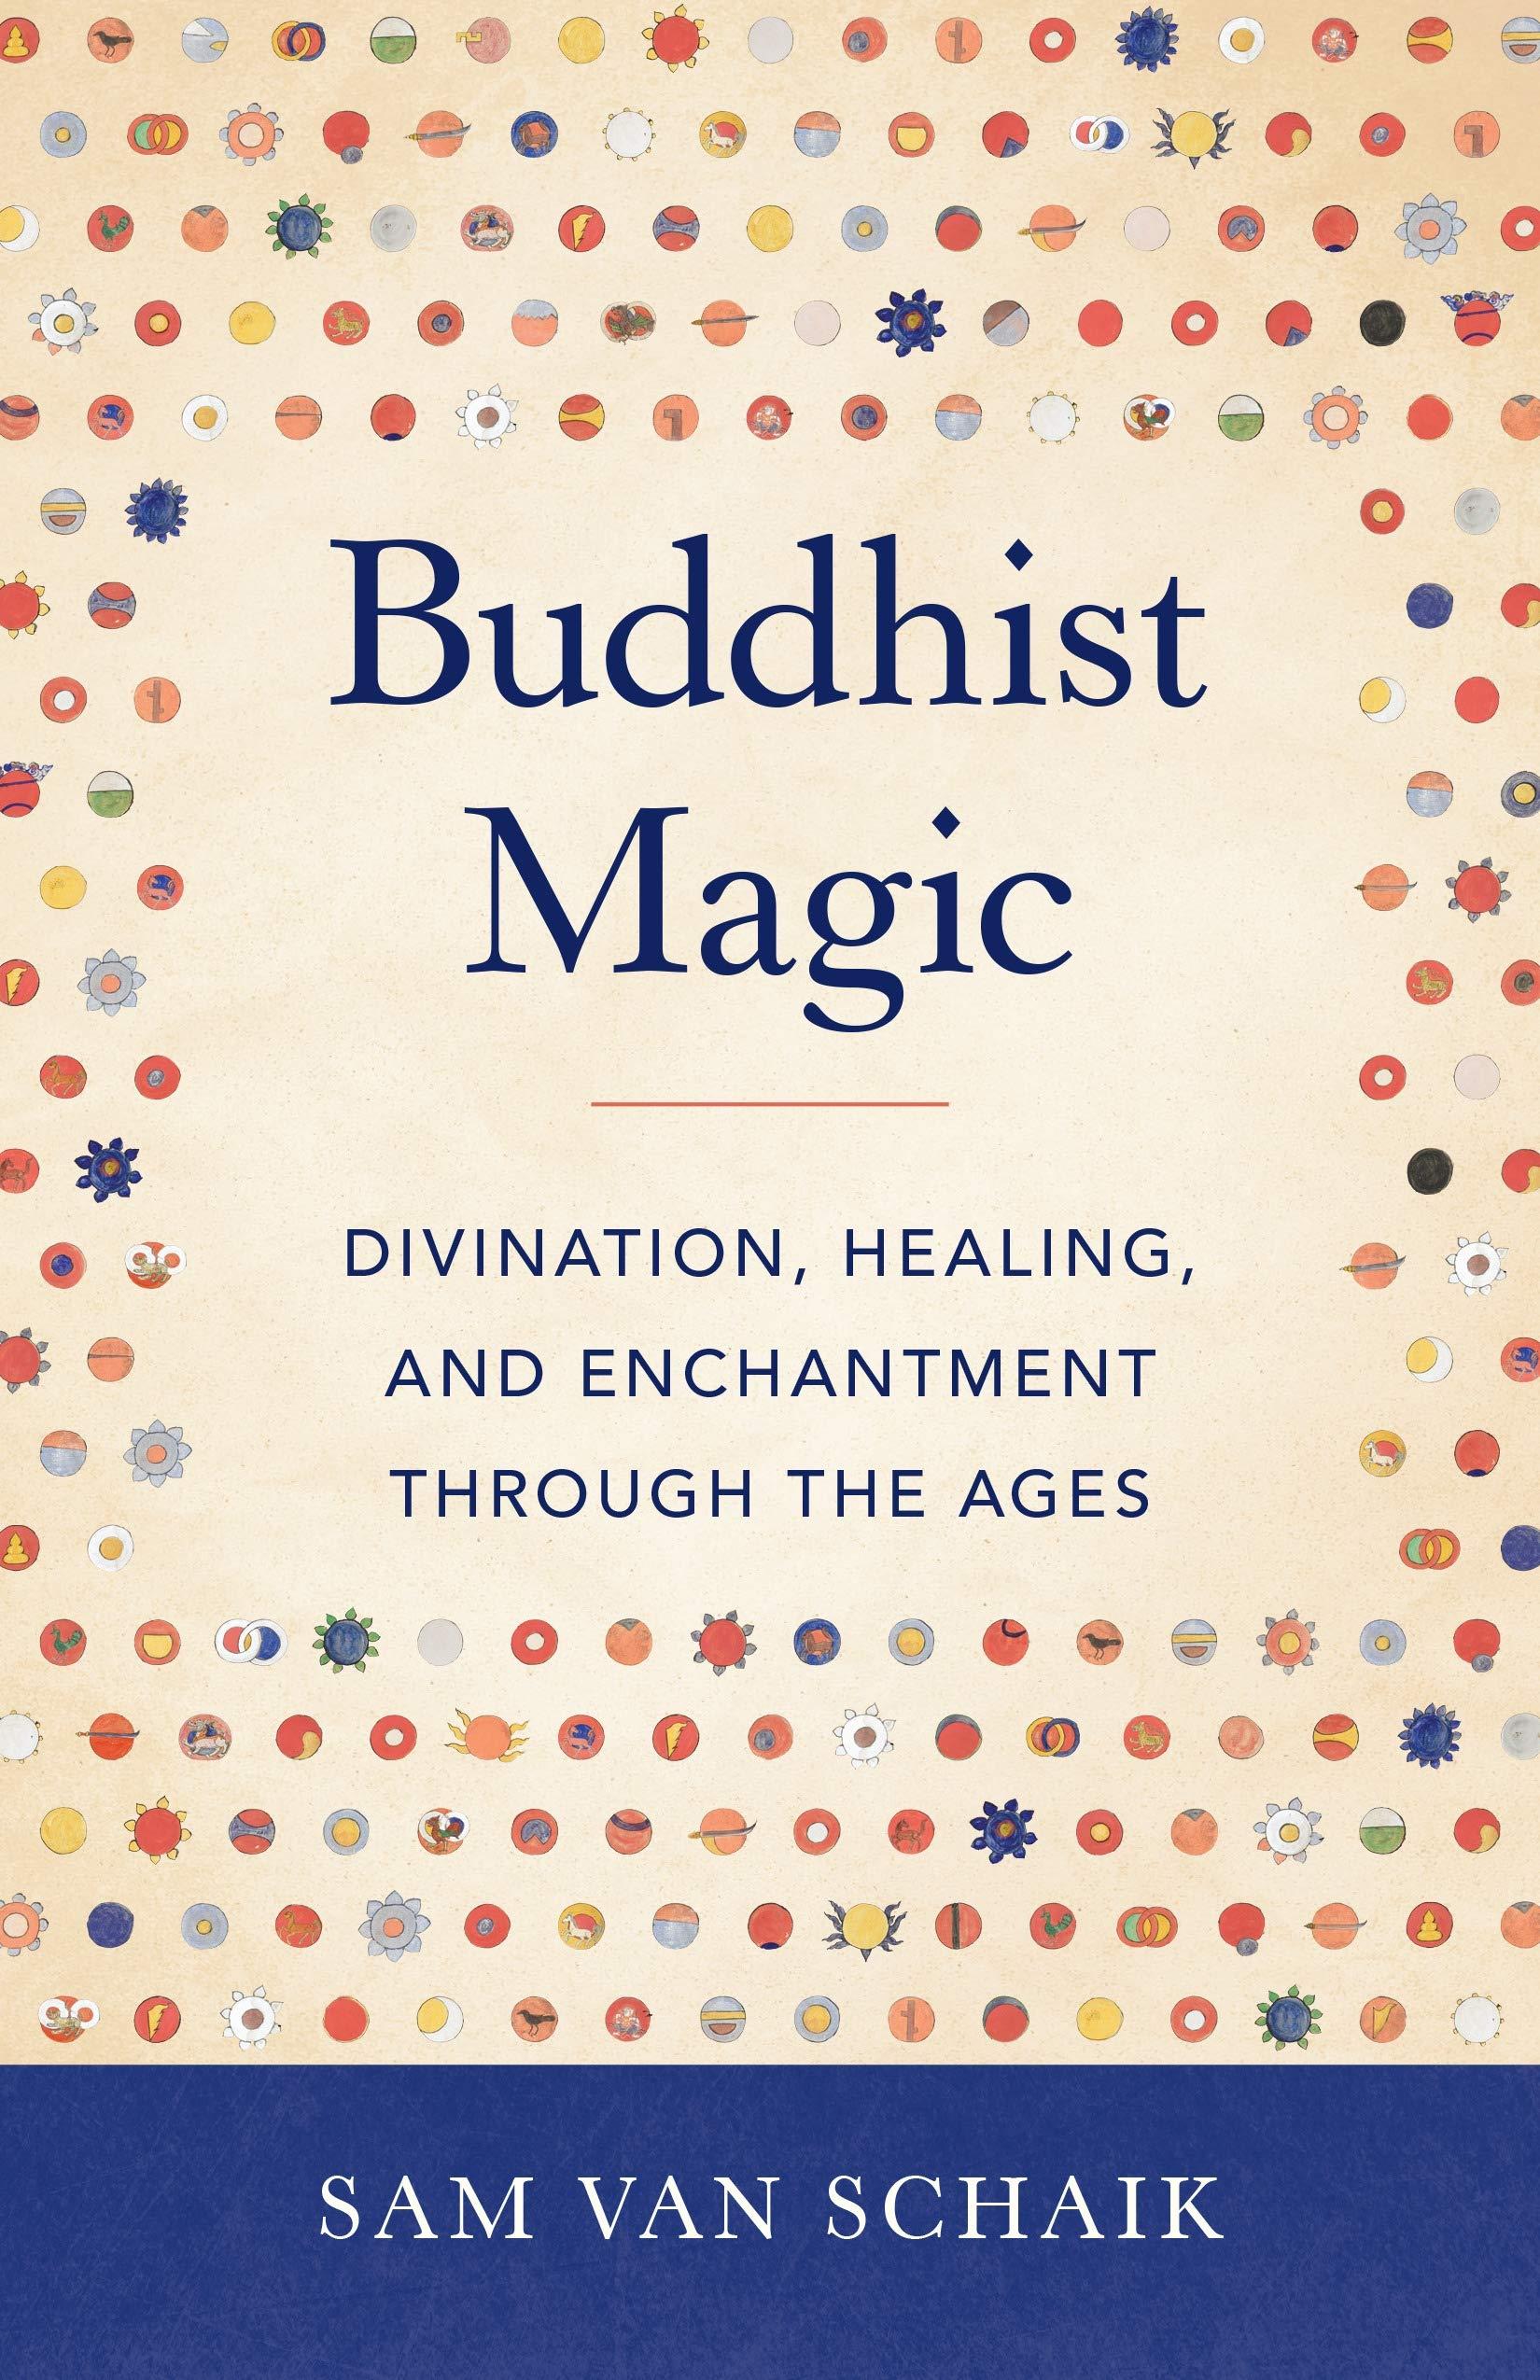 Buddhist Magic: Divination, Healing, and Enchantment through the Ages: van  Schaik, Sam: 9781611808254: Amazon.com: Books